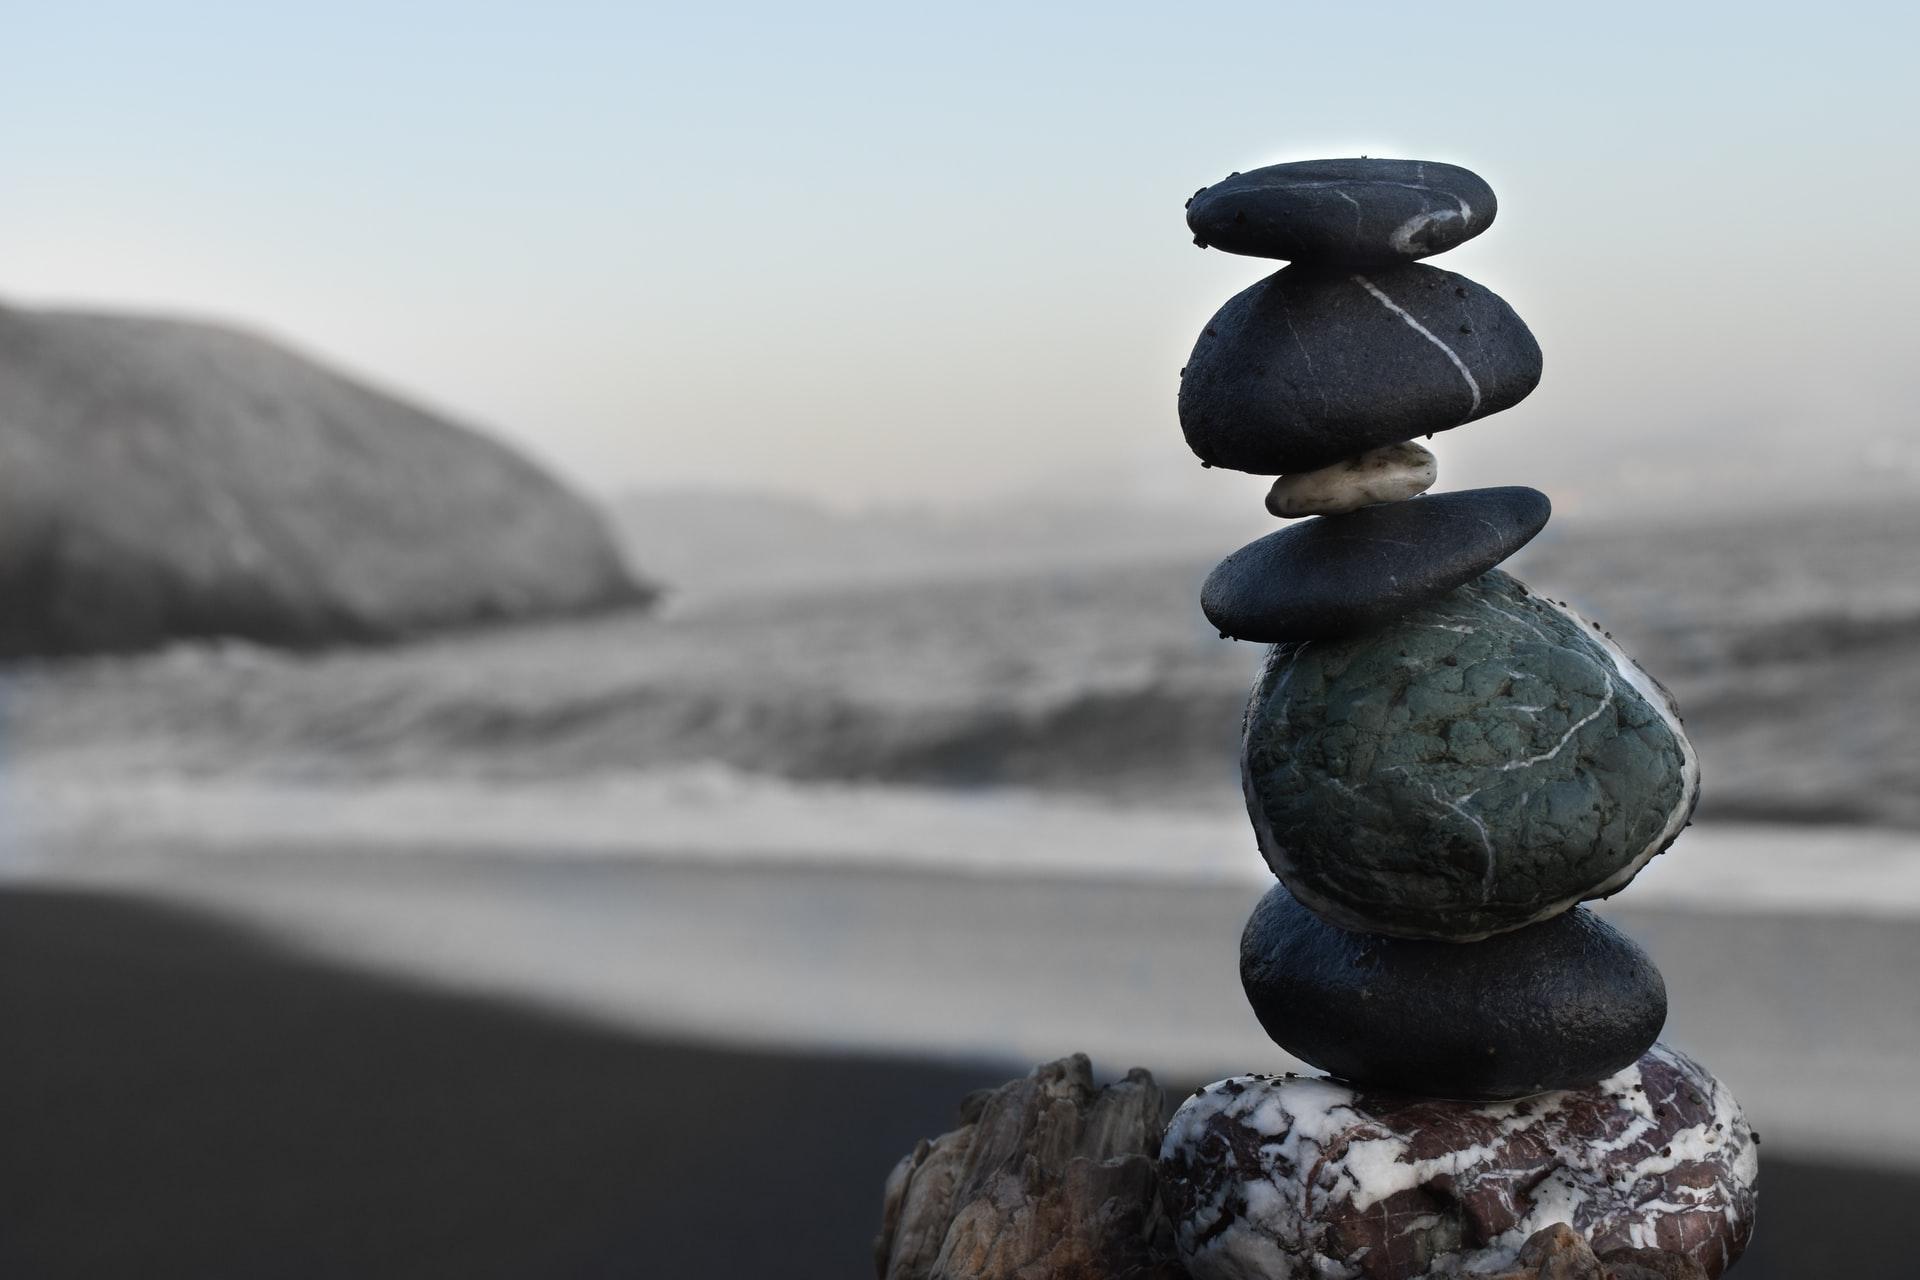 De perfecte work-life balance